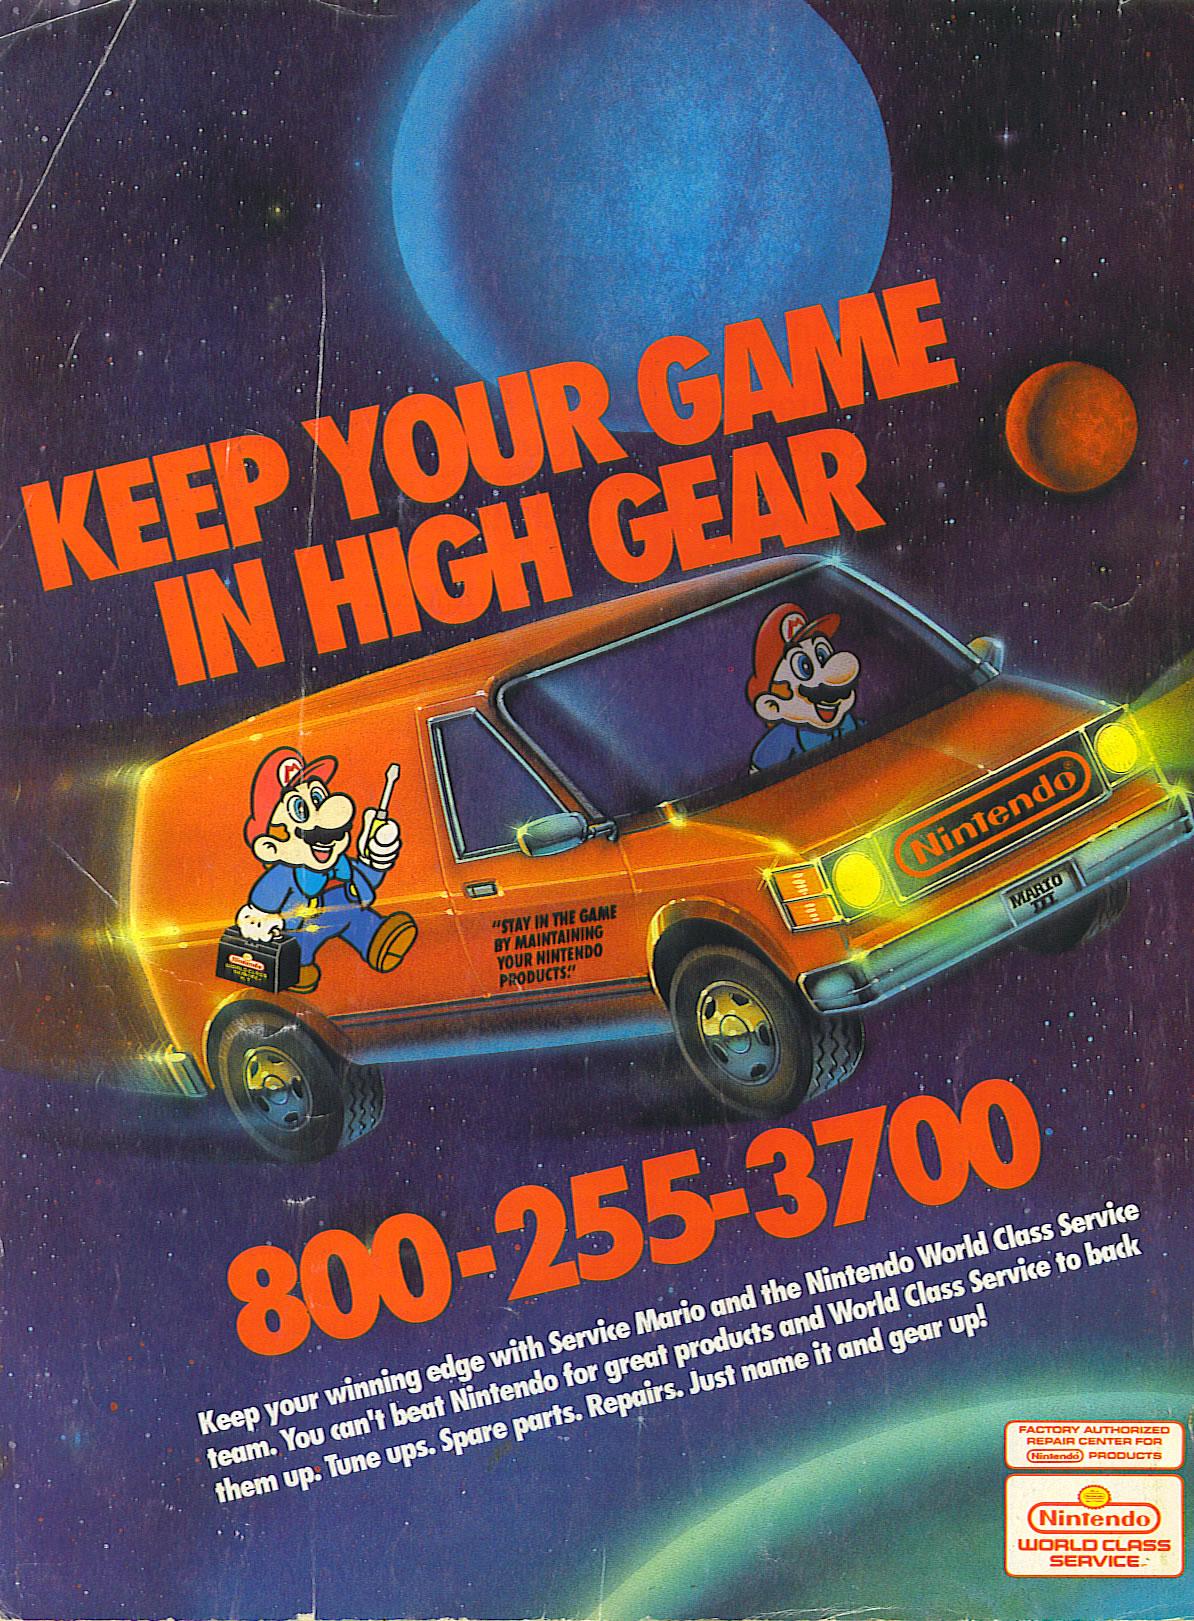 TMK | Mario Mania | Commercials & Advertisements | Print Ads